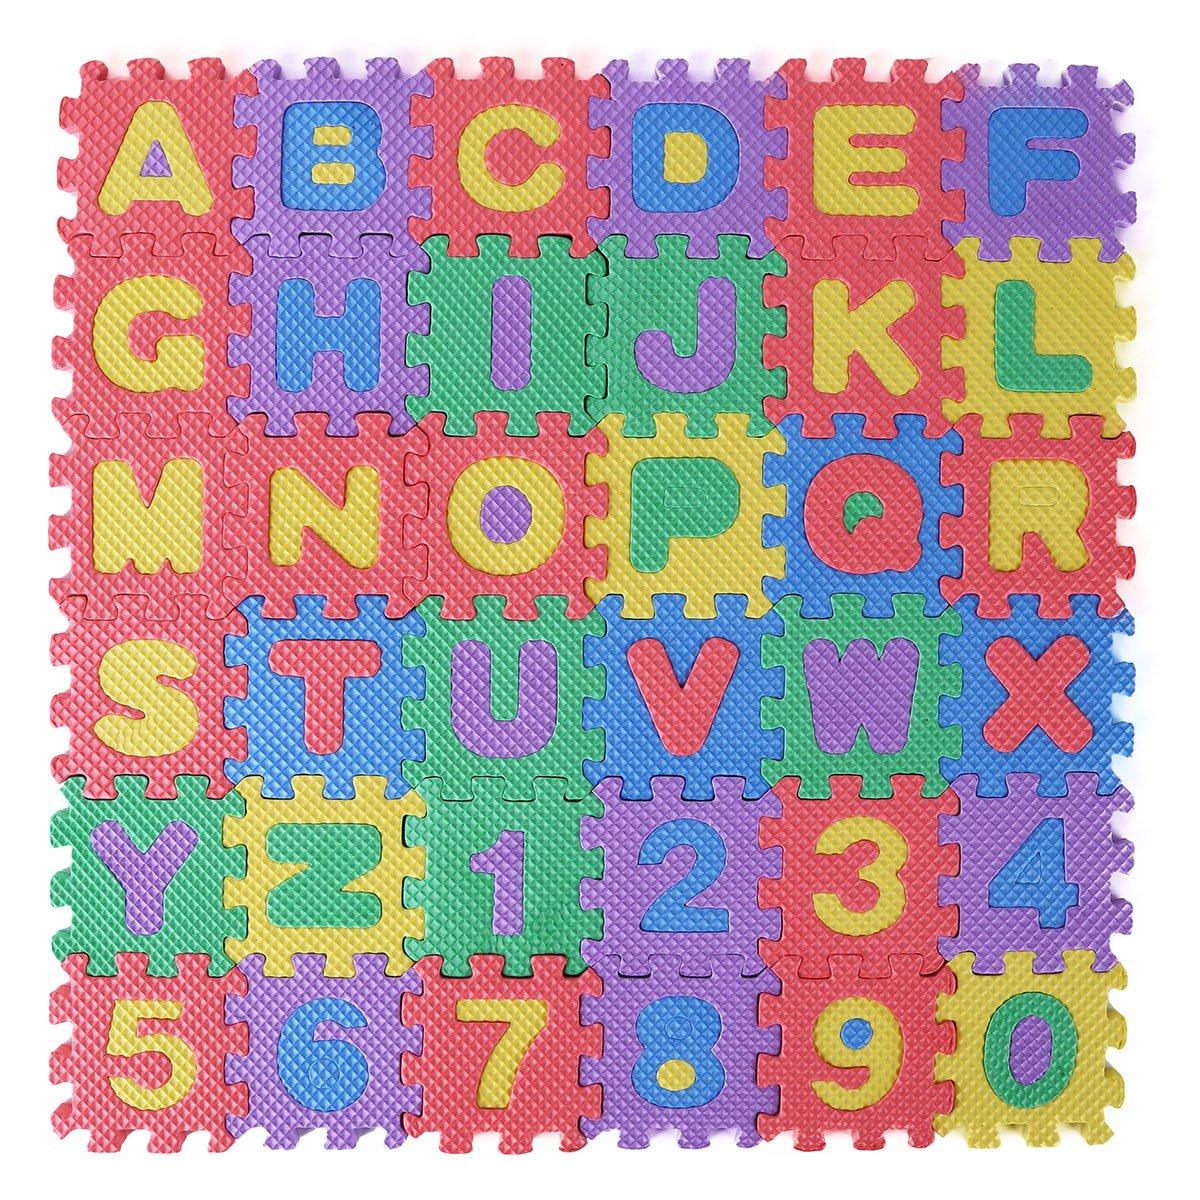 Educational Aspiring Foam Puzzle Mat Alphabet Floor Abc Letters Play Interlocking Kids Educational